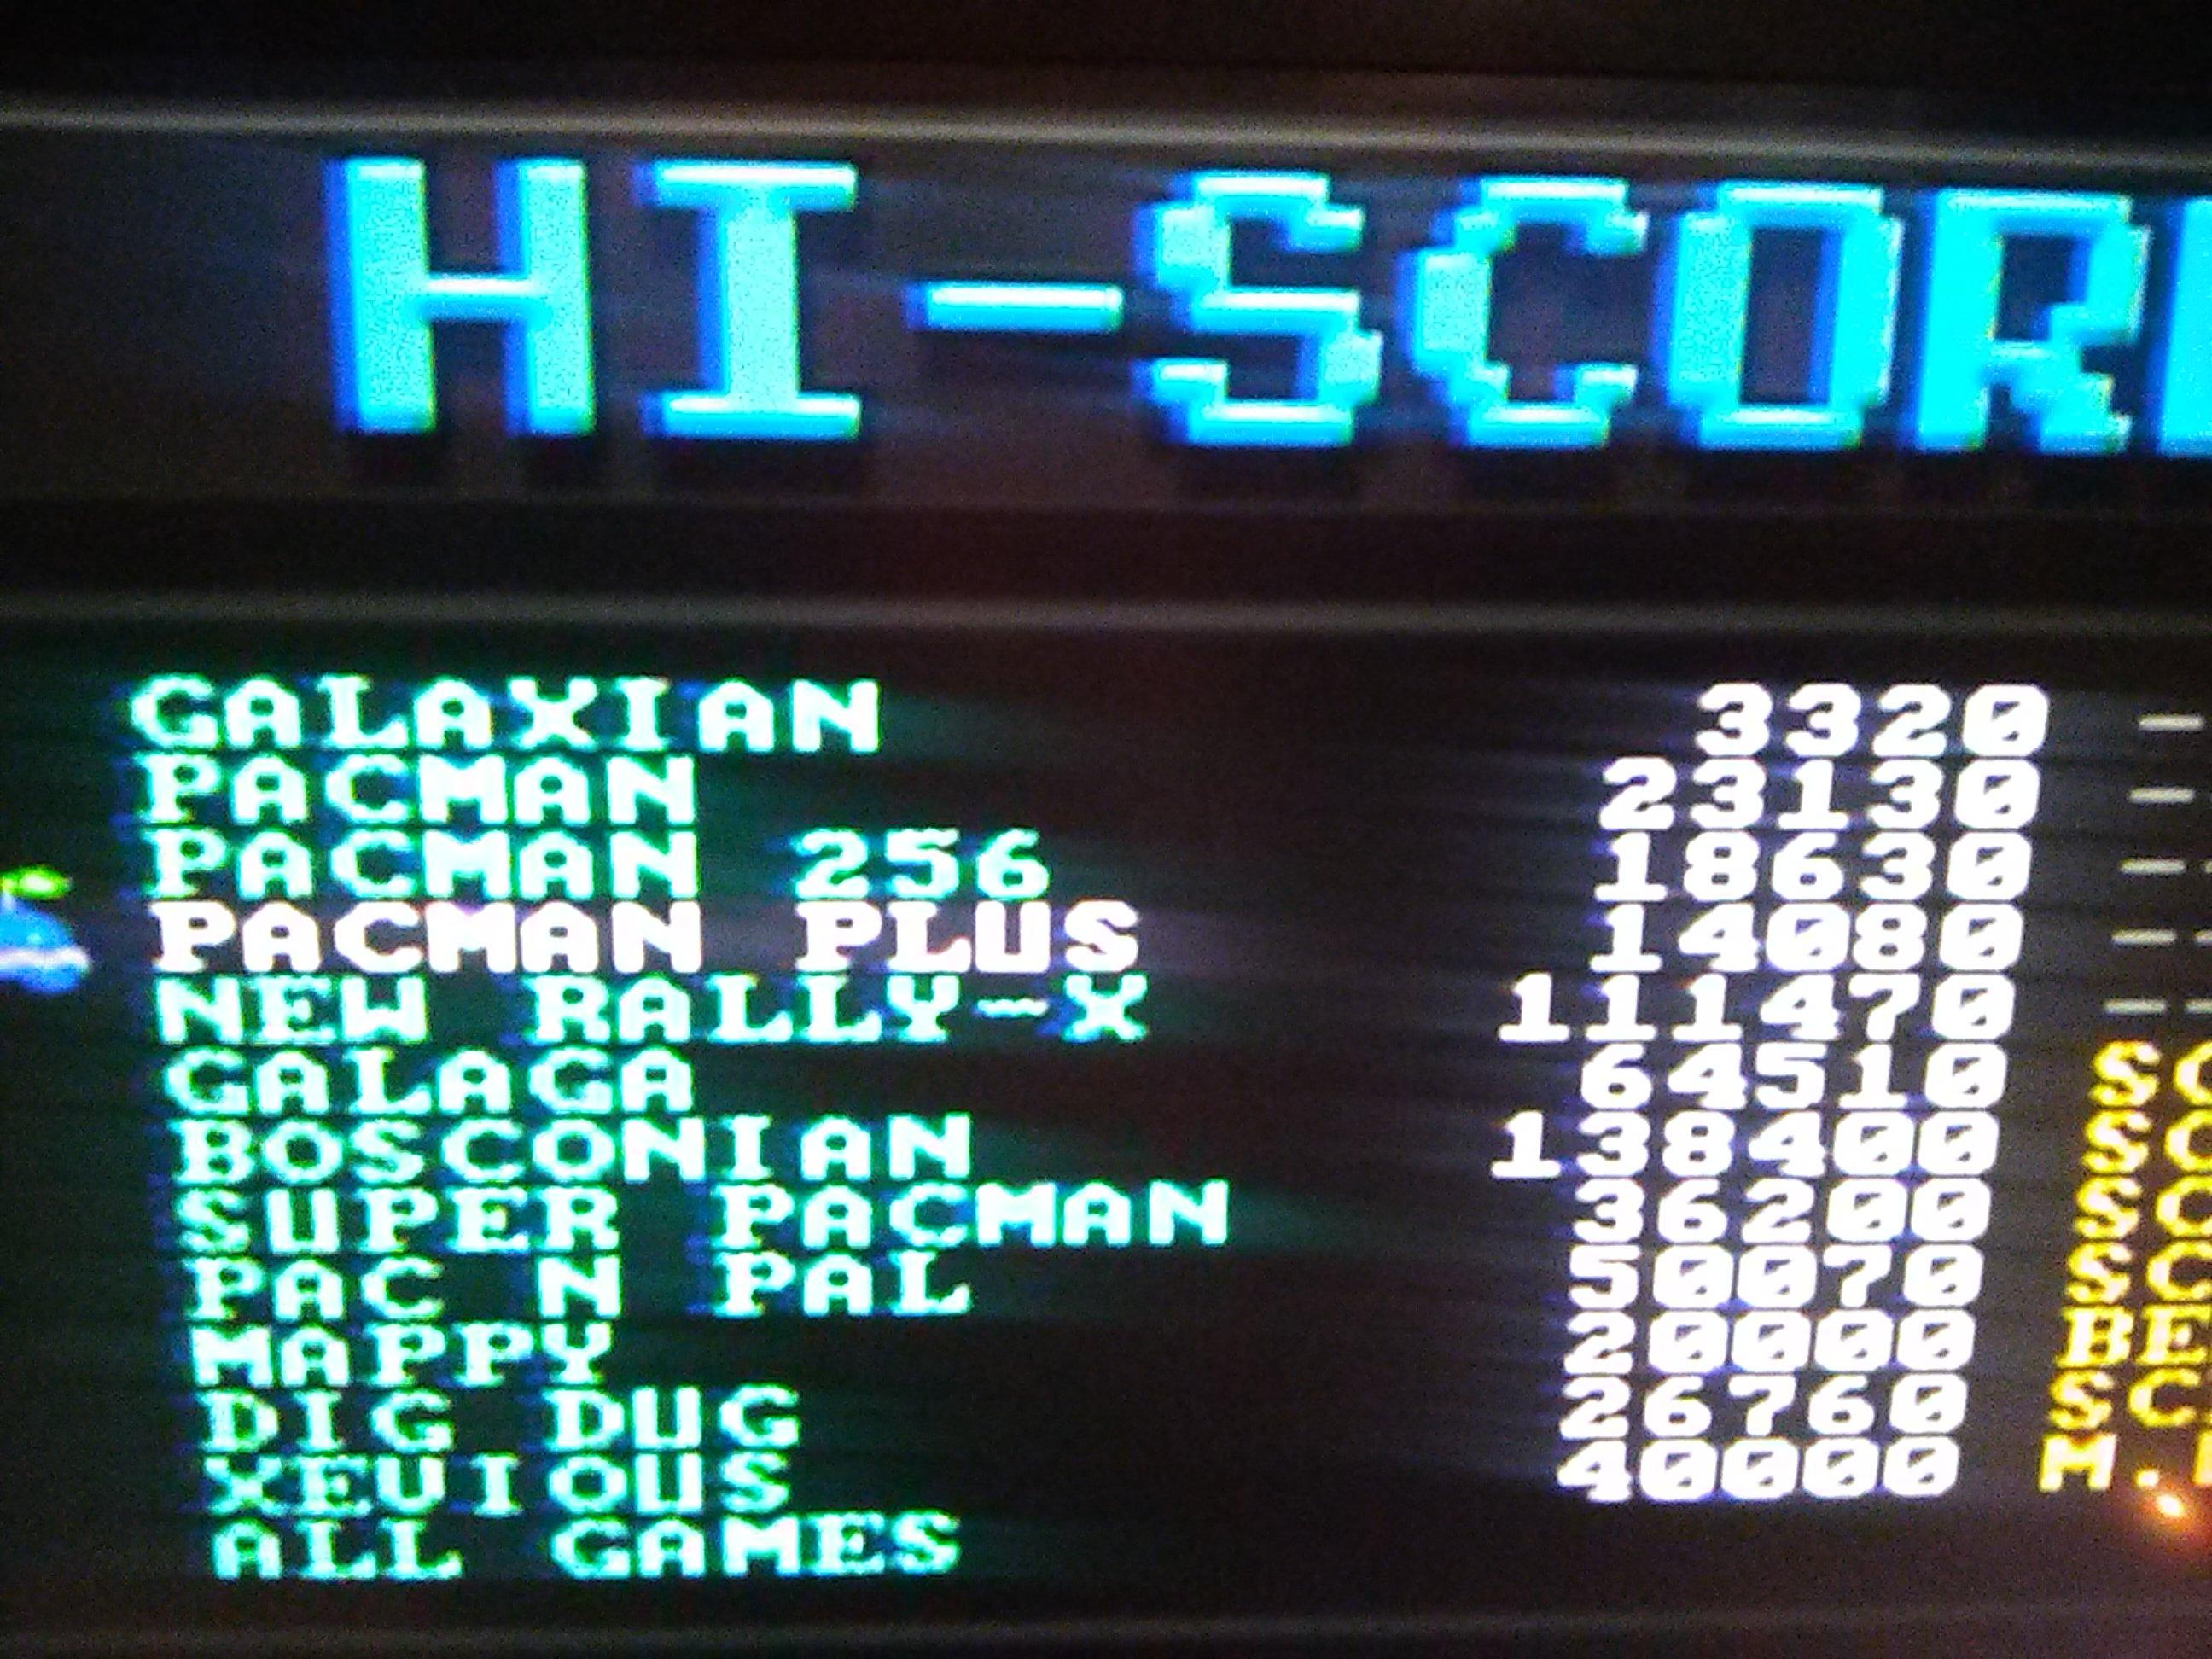 Pac-man Plus 14,080 points